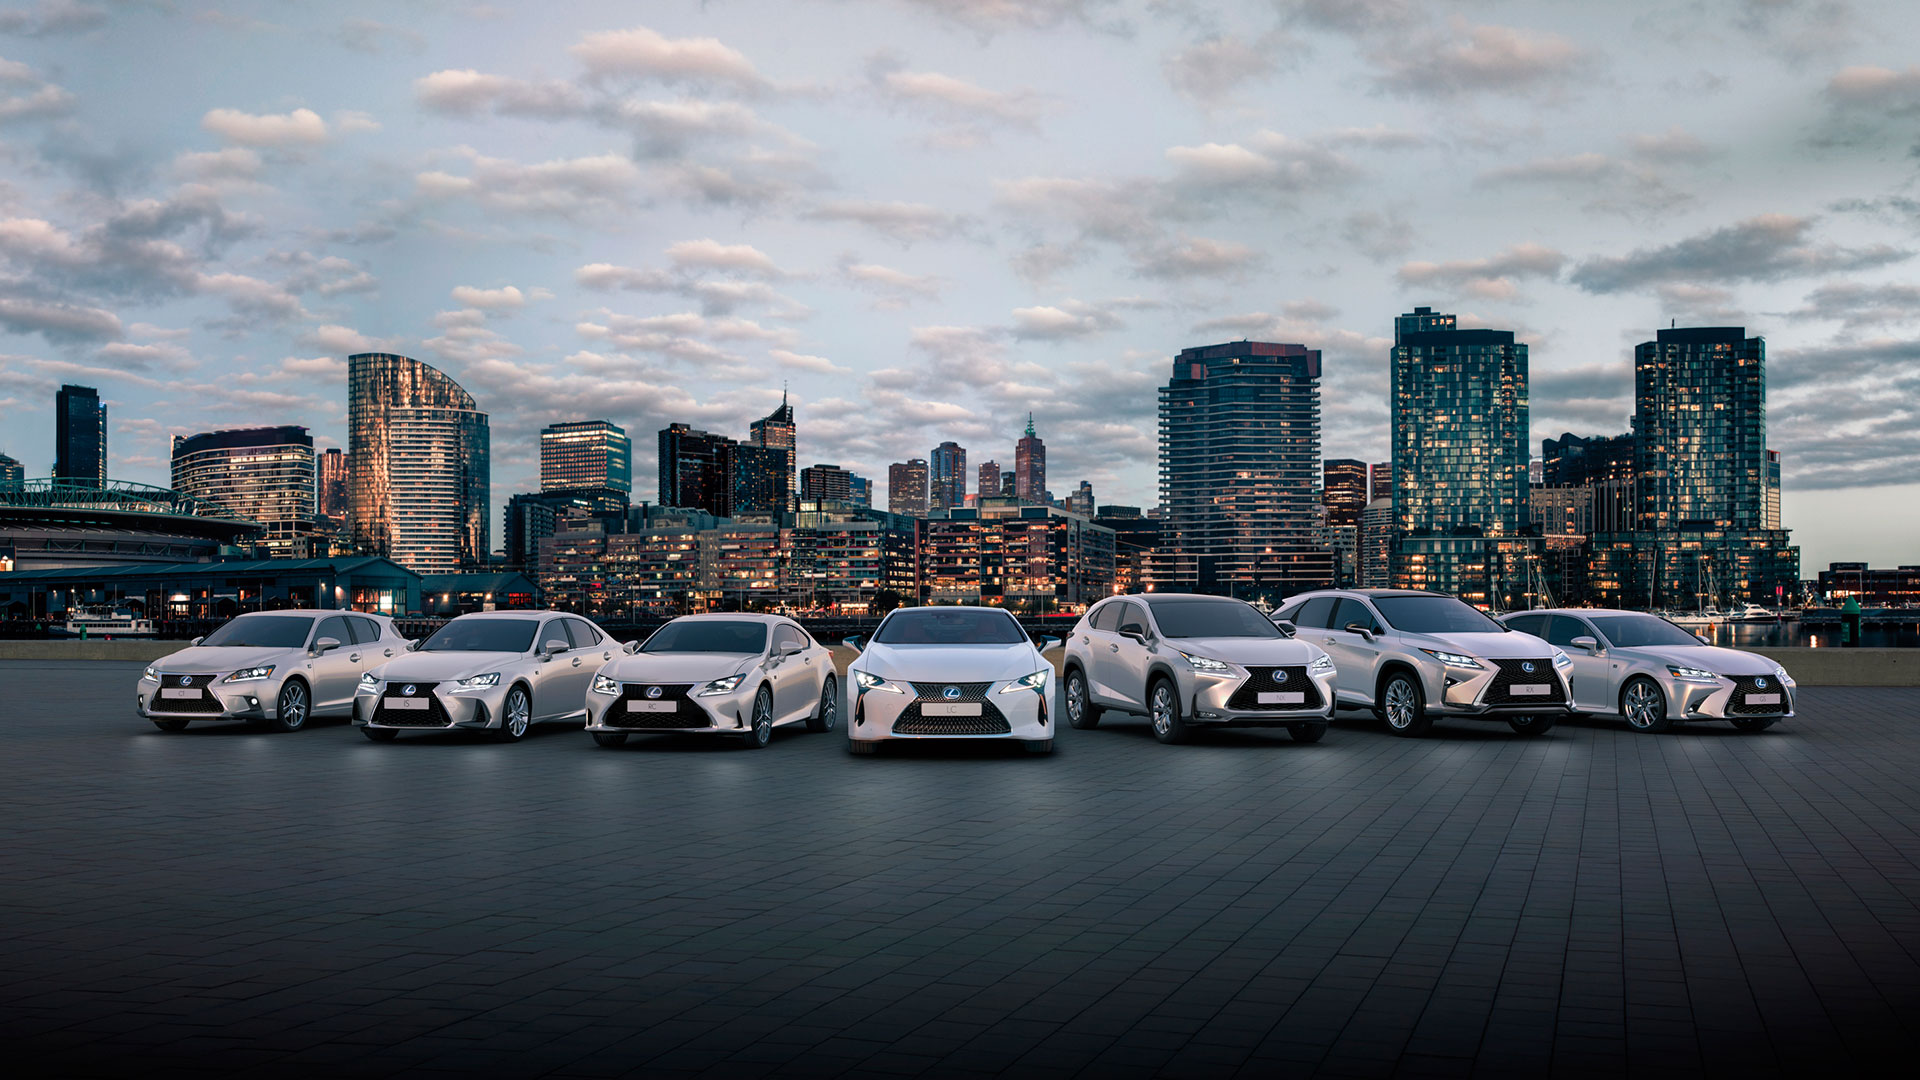 Lexus lanza en España el programa Lexus Business Plus hero asset